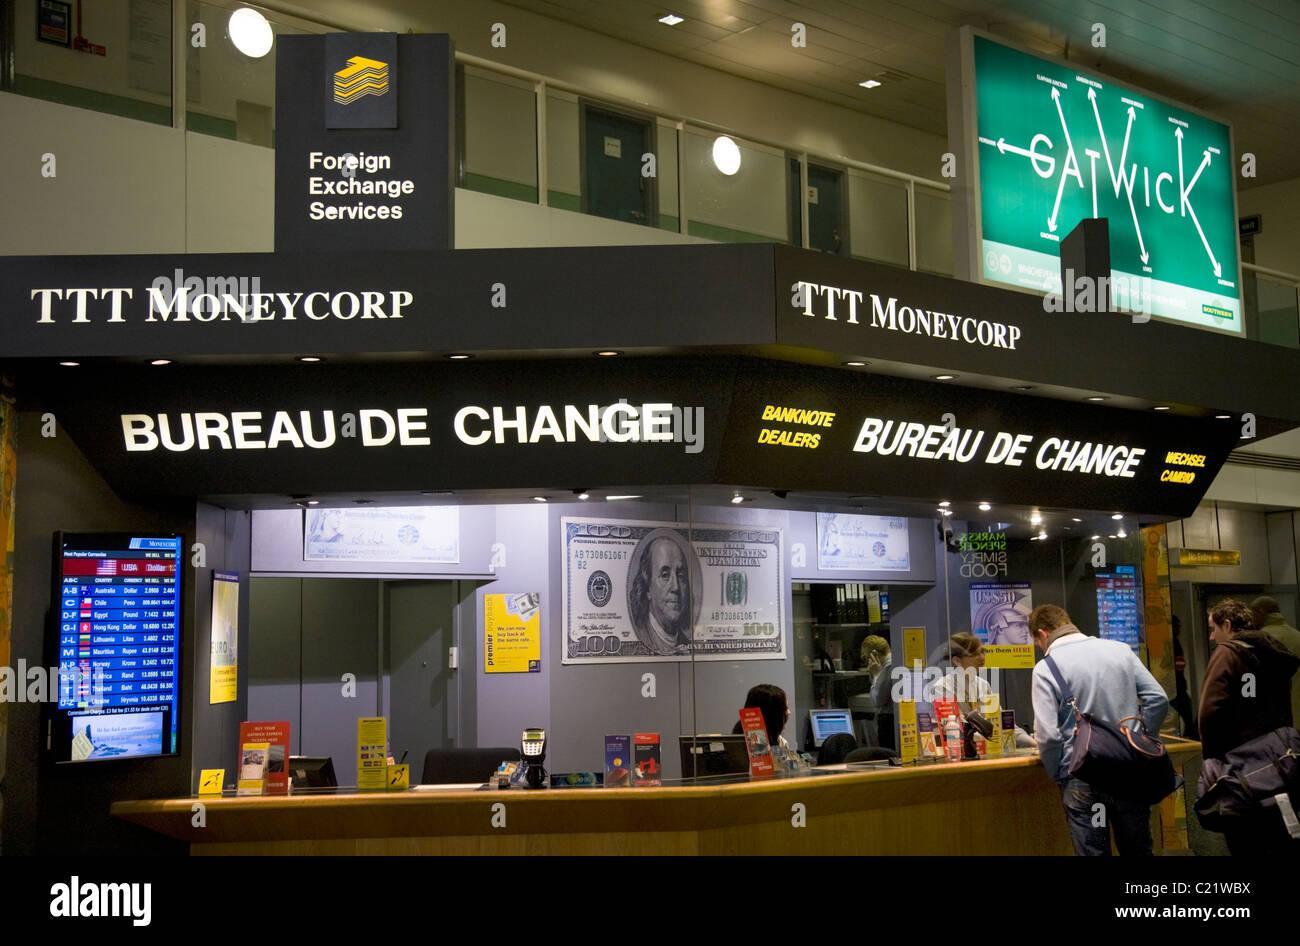 ttt moneycorp bureau de change office gatwick airport south terminal london uk